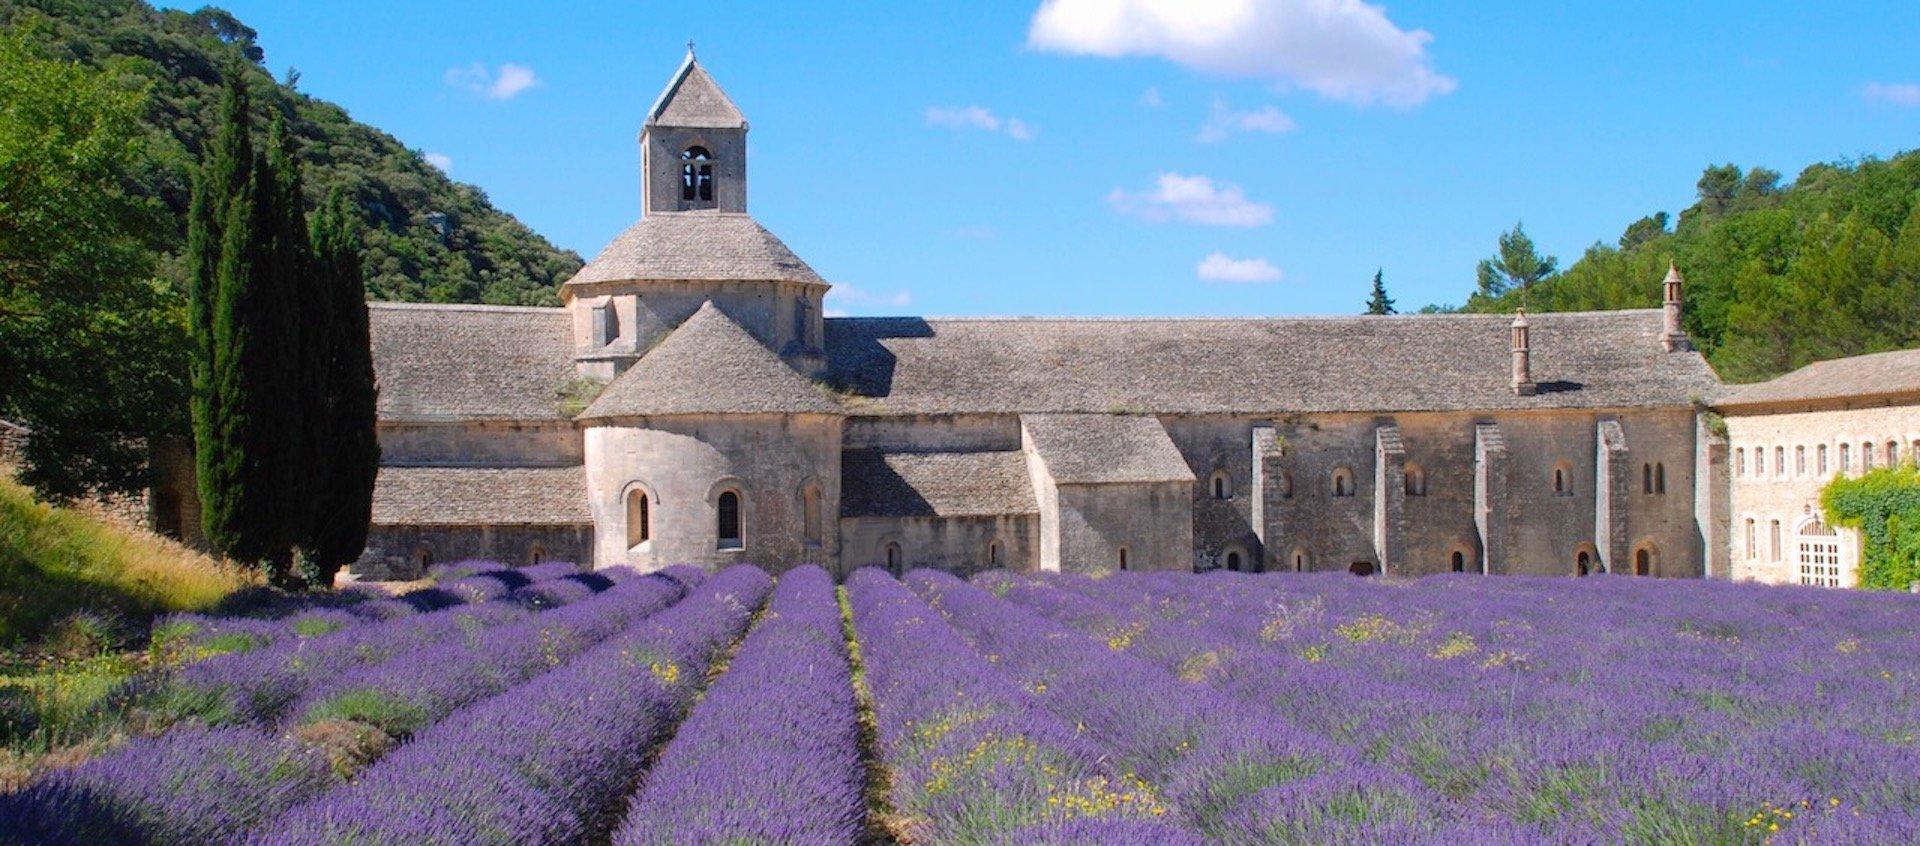 Abbaye de Fontevraud histoire • Voyages - Cartes